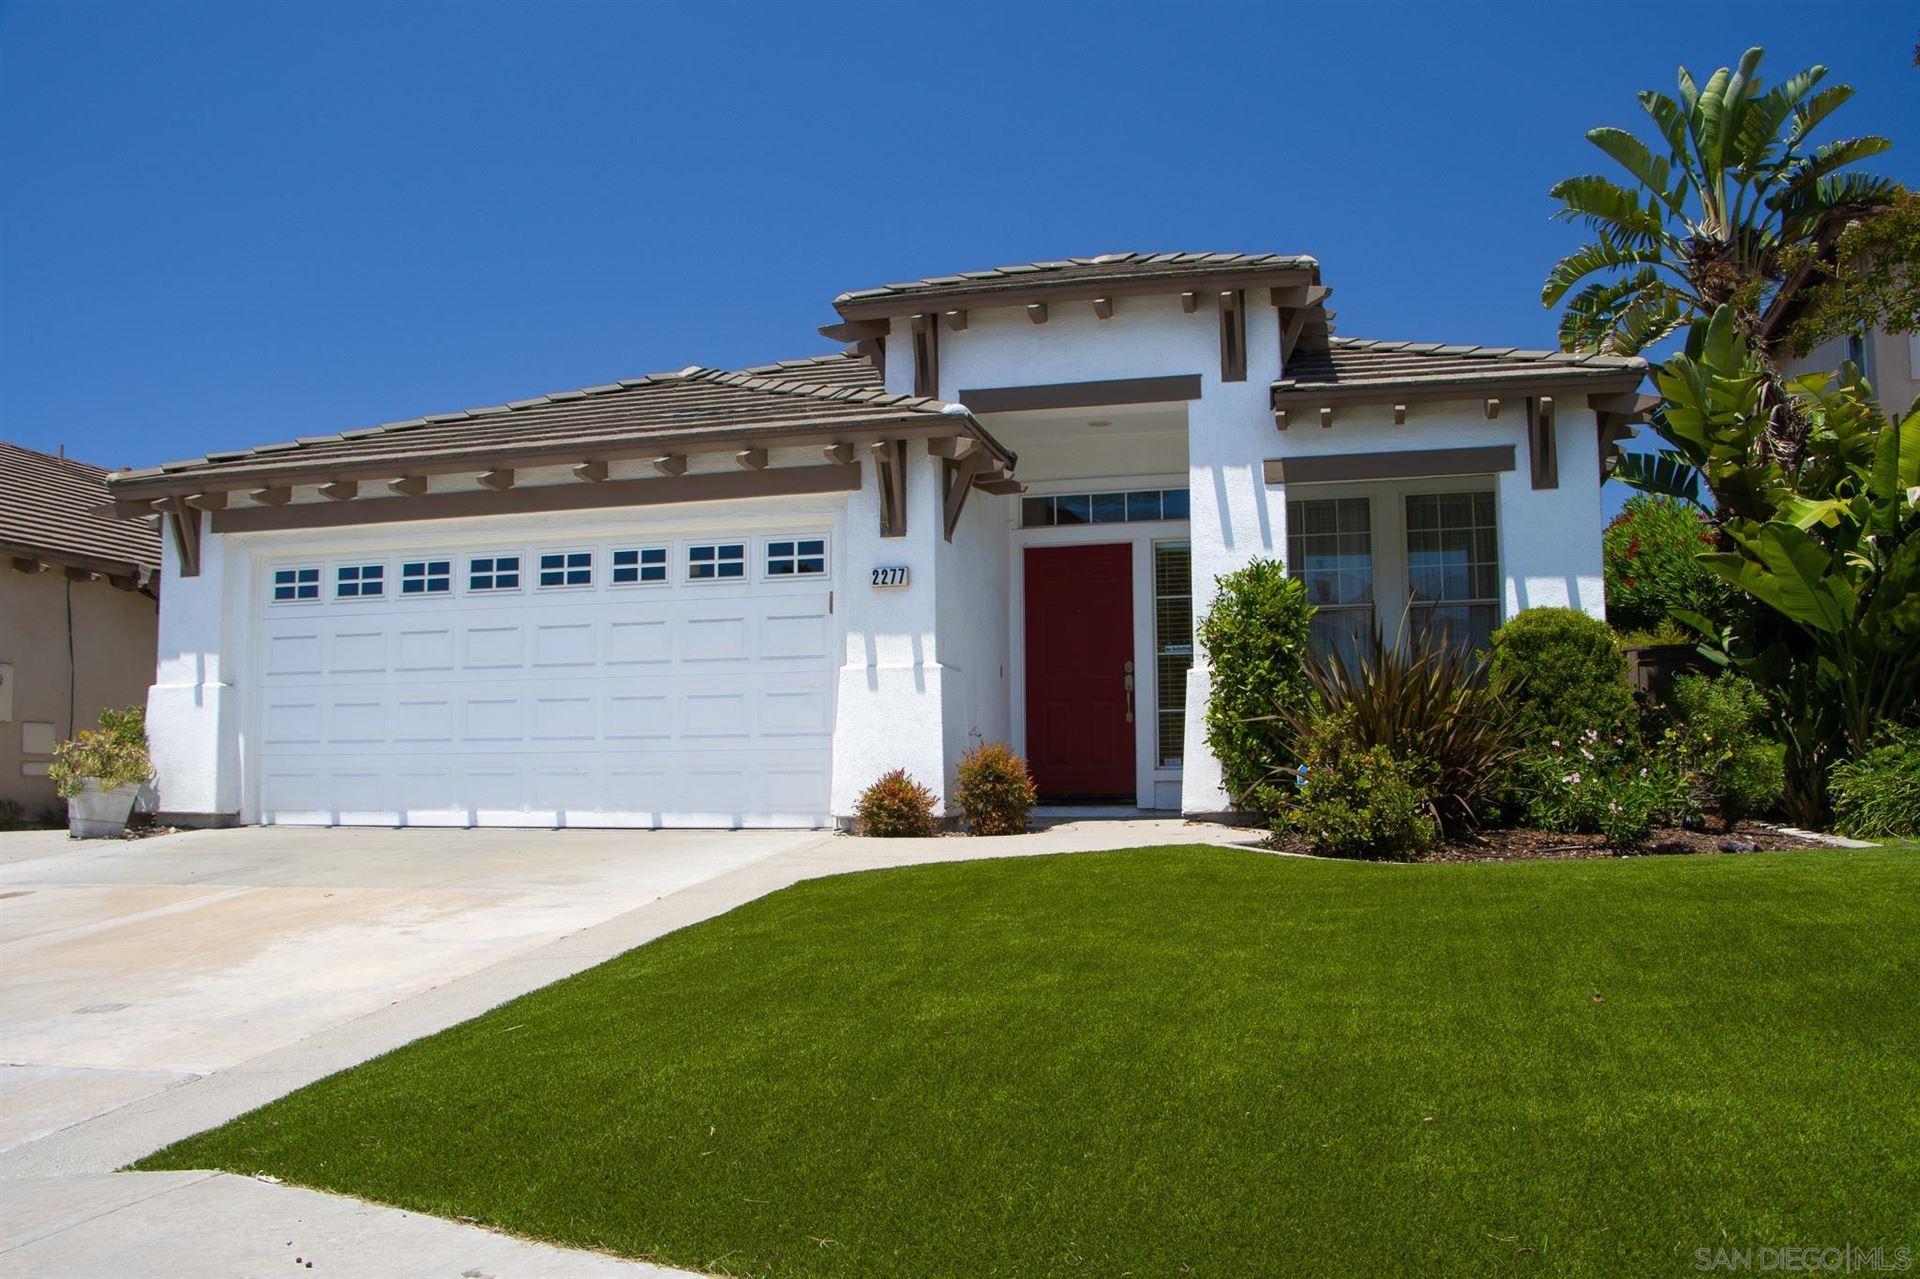 Photo of 2277 Annadale Way, Chula Vista, CA 91915 (MLS # 210021641)